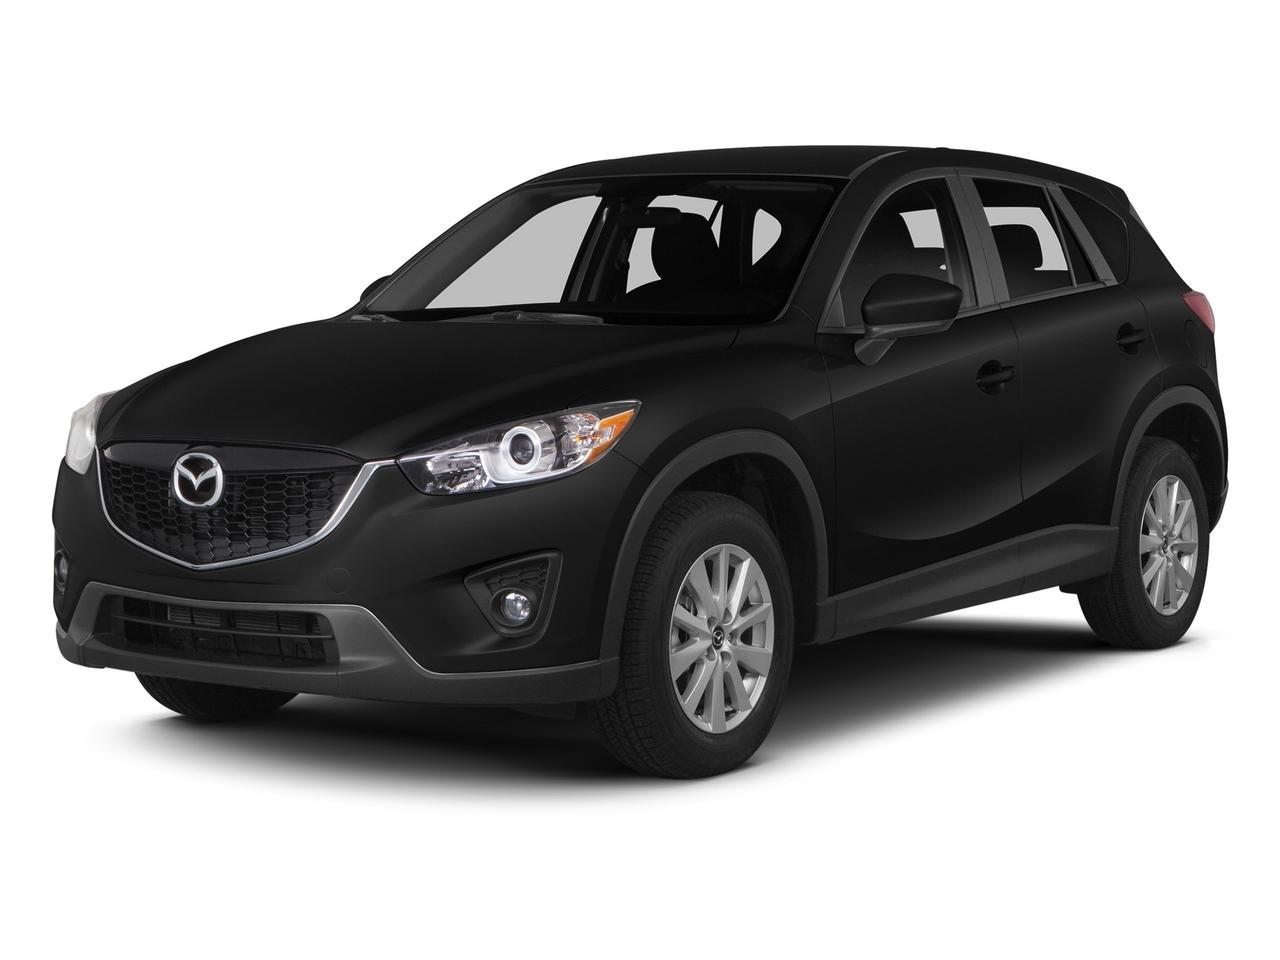 2015 Mazda CX-5 Vehicle Photo in Killeen, TX 76541